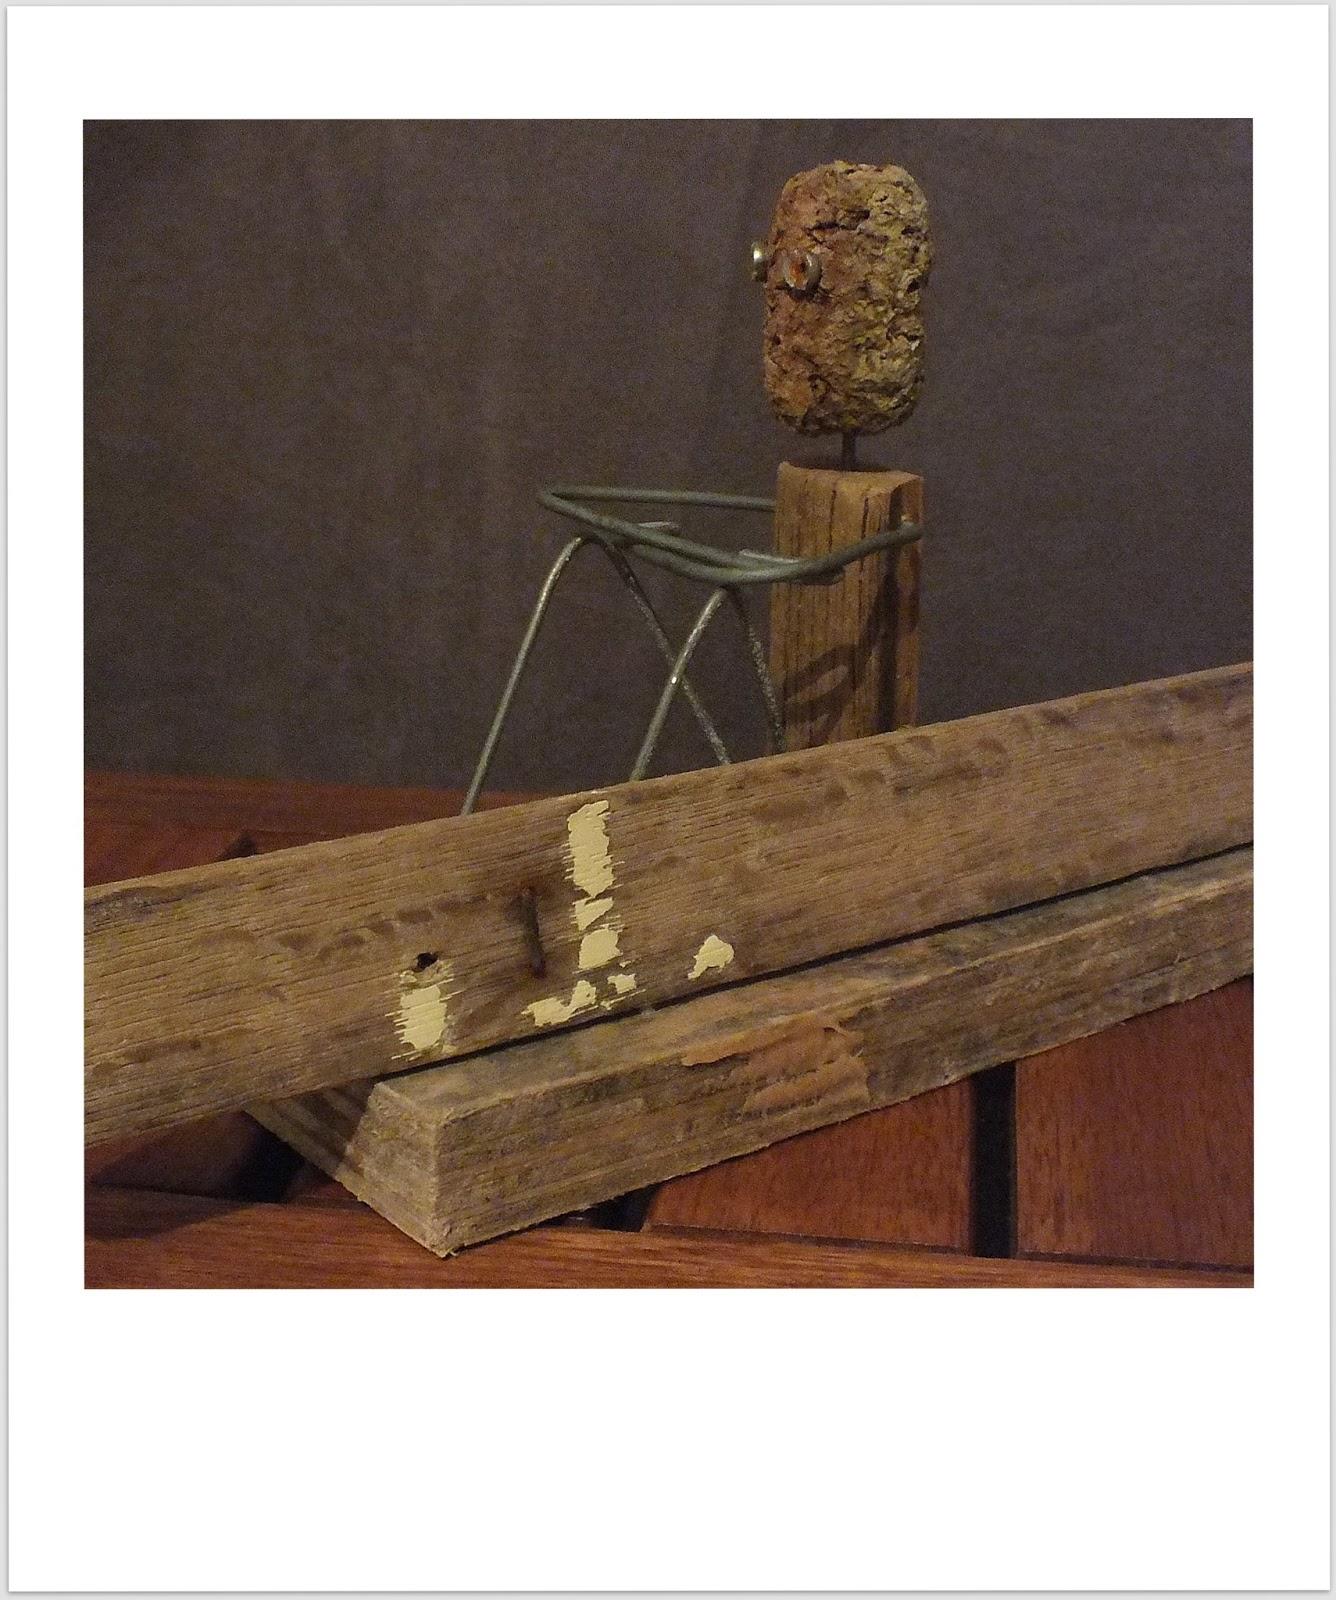 hossegor 1989 statuette de surfeur en bois flott mutoz inc art en bois flott. Black Bedroom Furniture Sets. Home Design Ideas